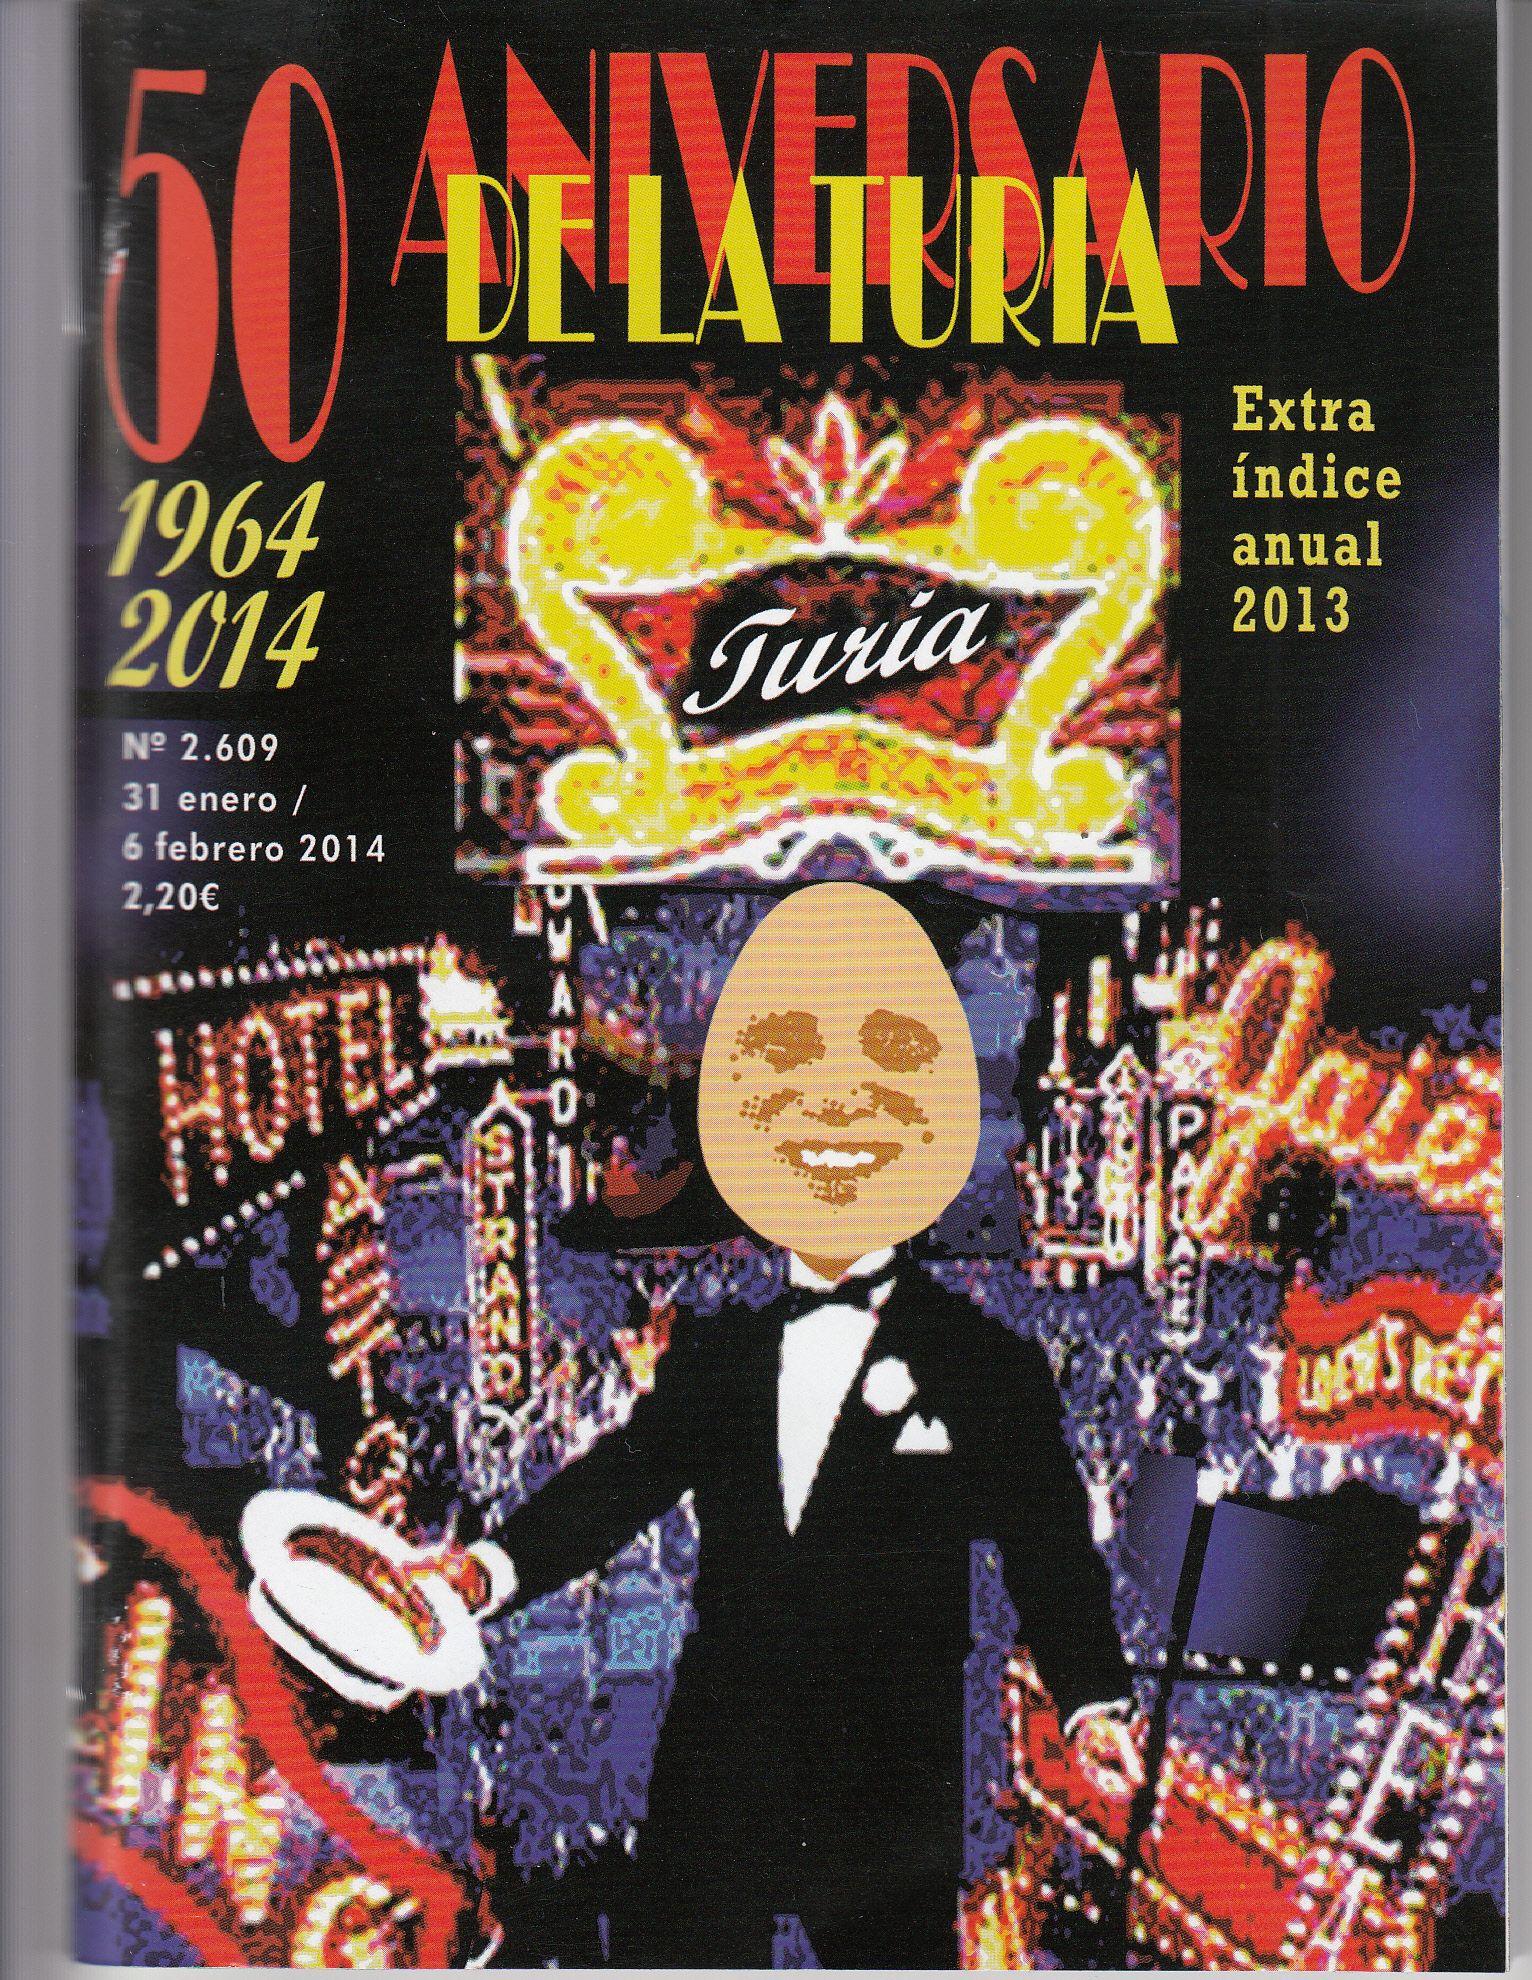 50 aniversario de la cartelera Turia